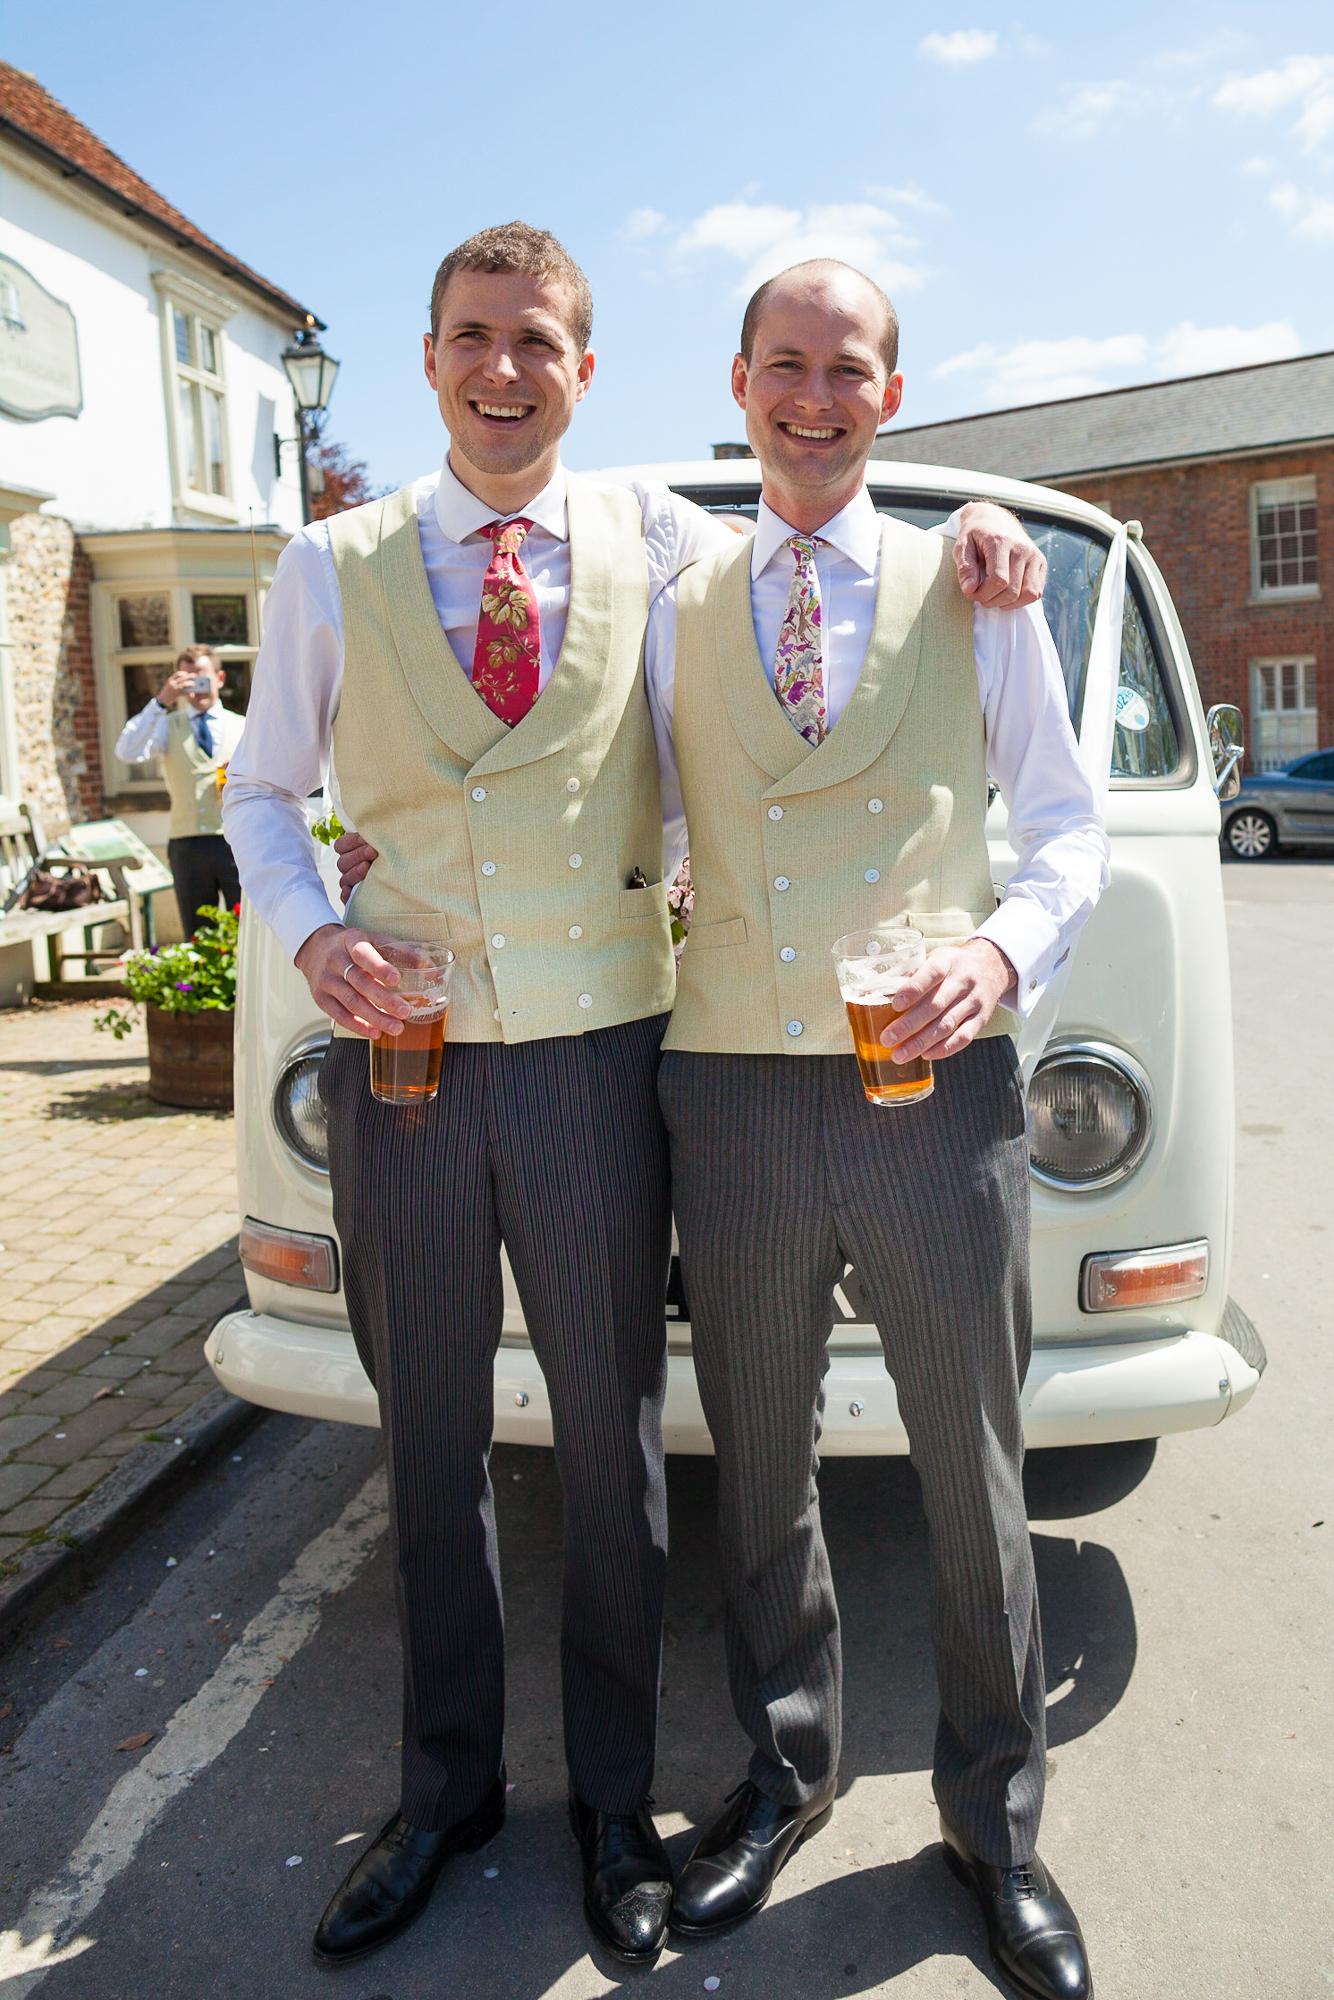 wedding photographer (1 of 1)-7.jpg